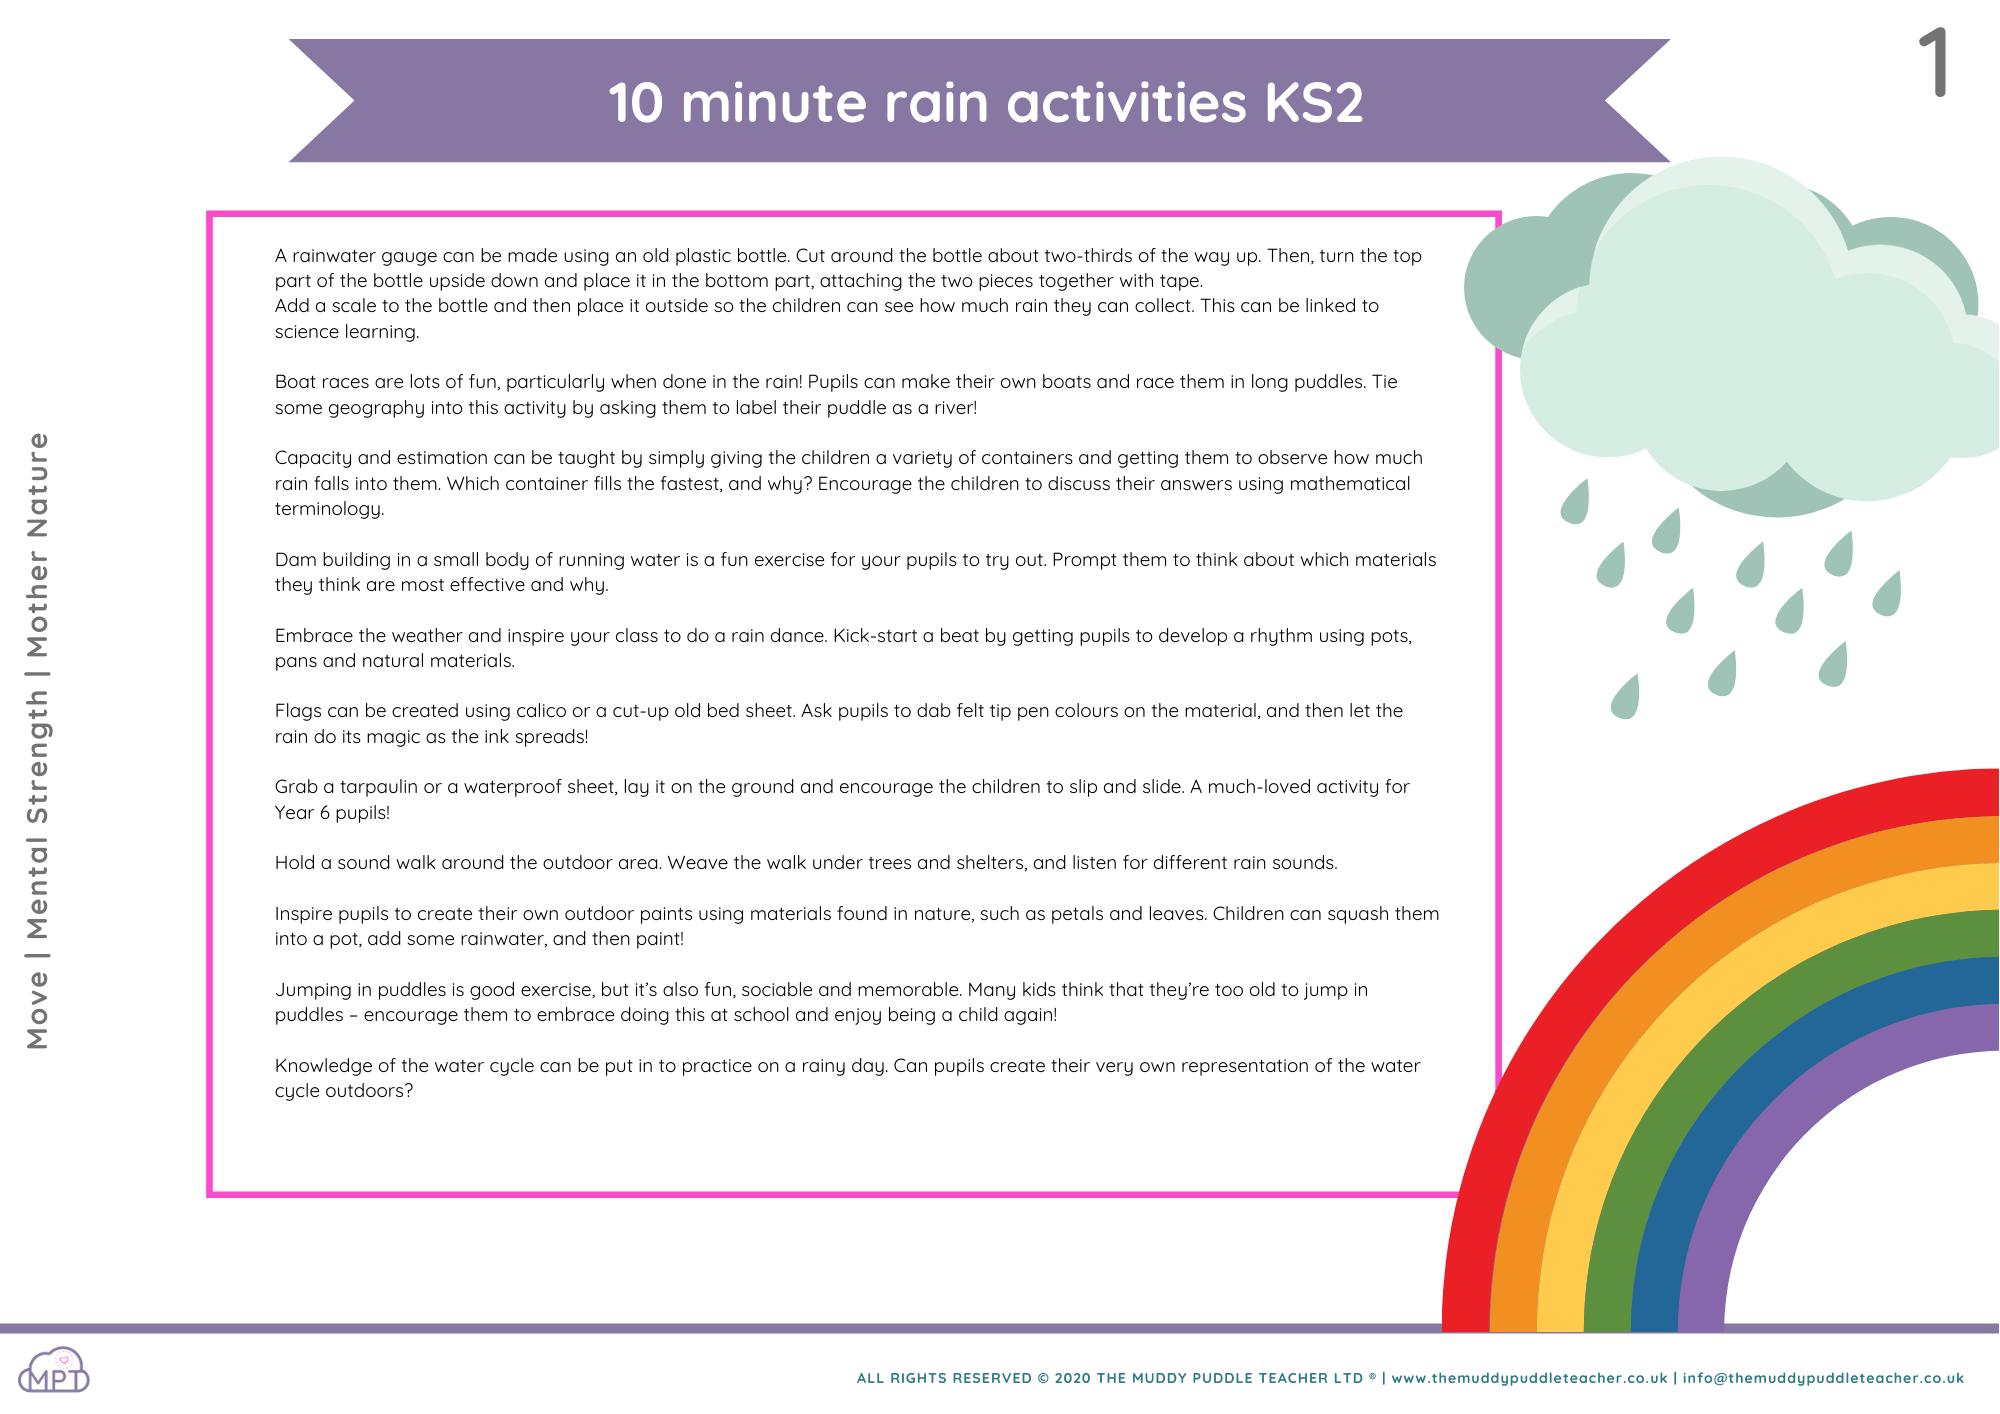 10 minute rain activities (KS2)